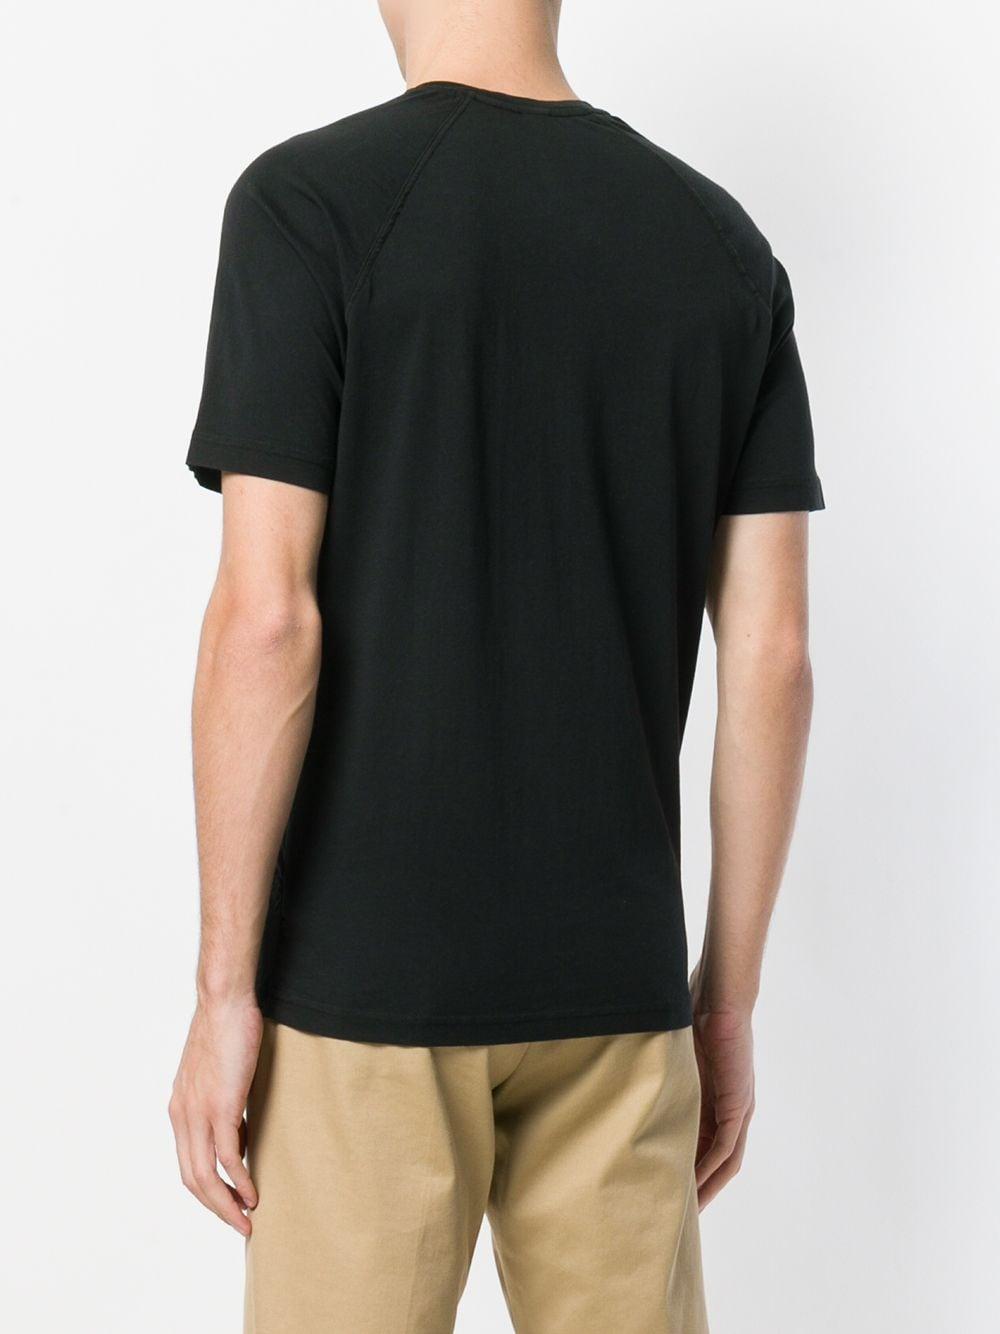 Aspesi pocket t-shirt man ASPESI | T-shirts | AY28 A33501241